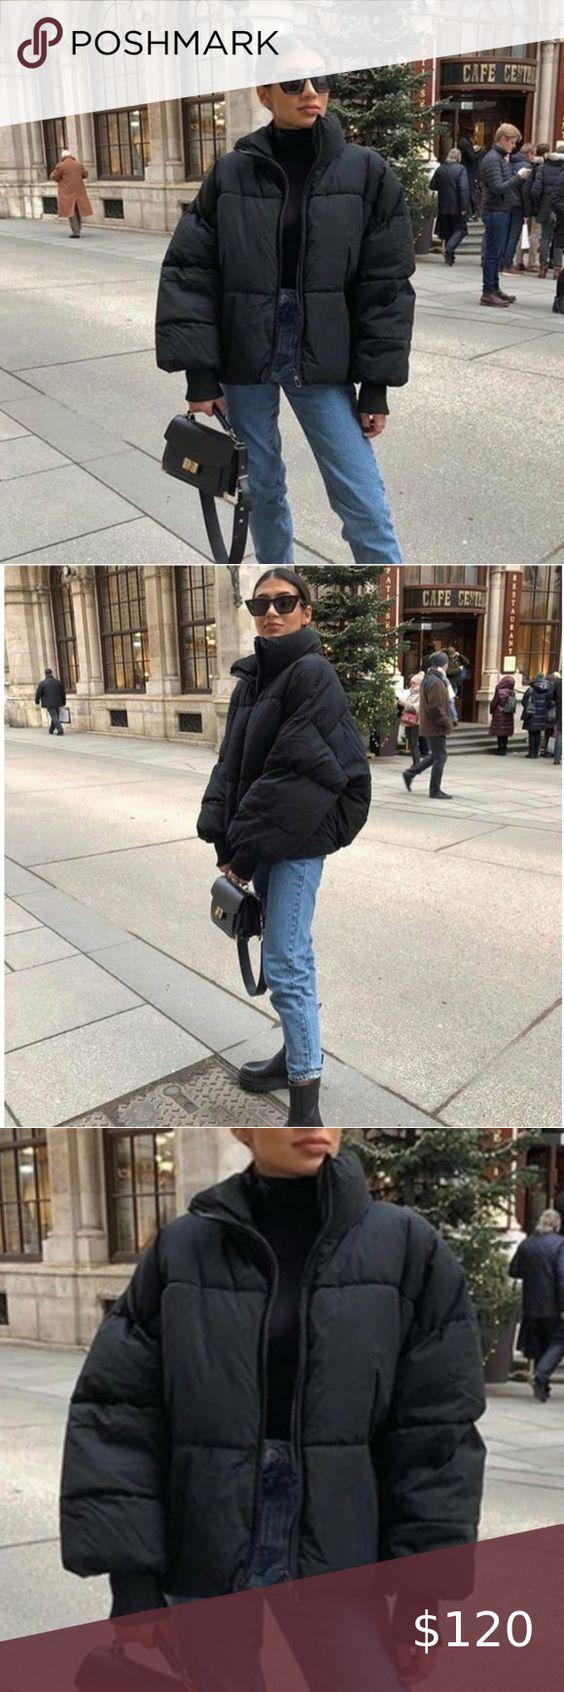 Nwt Zara Oversized Puffer Jacket Black [ 1692 x 564 Pixel ]